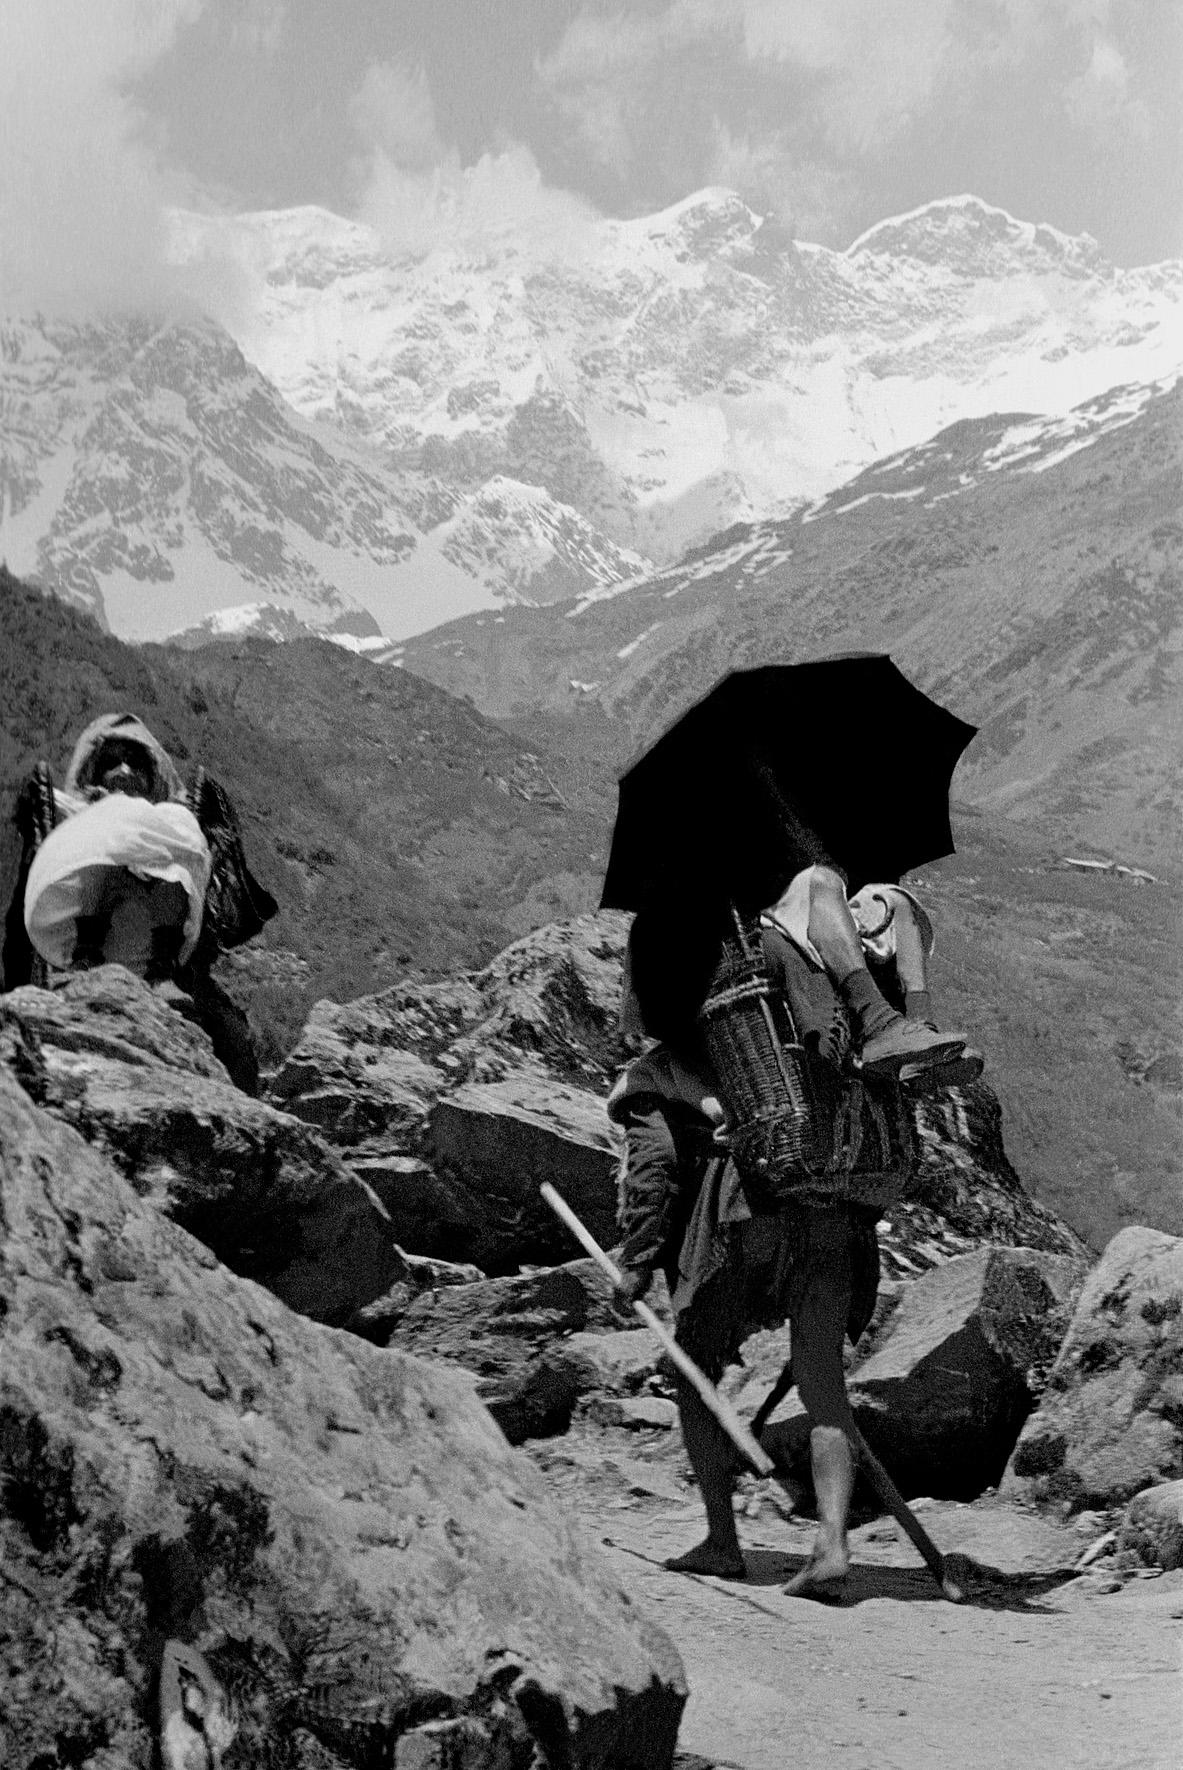 © Frank Horvat – Pilgrim with umbrella, India, 1953, Courtesy KLV Art Projects